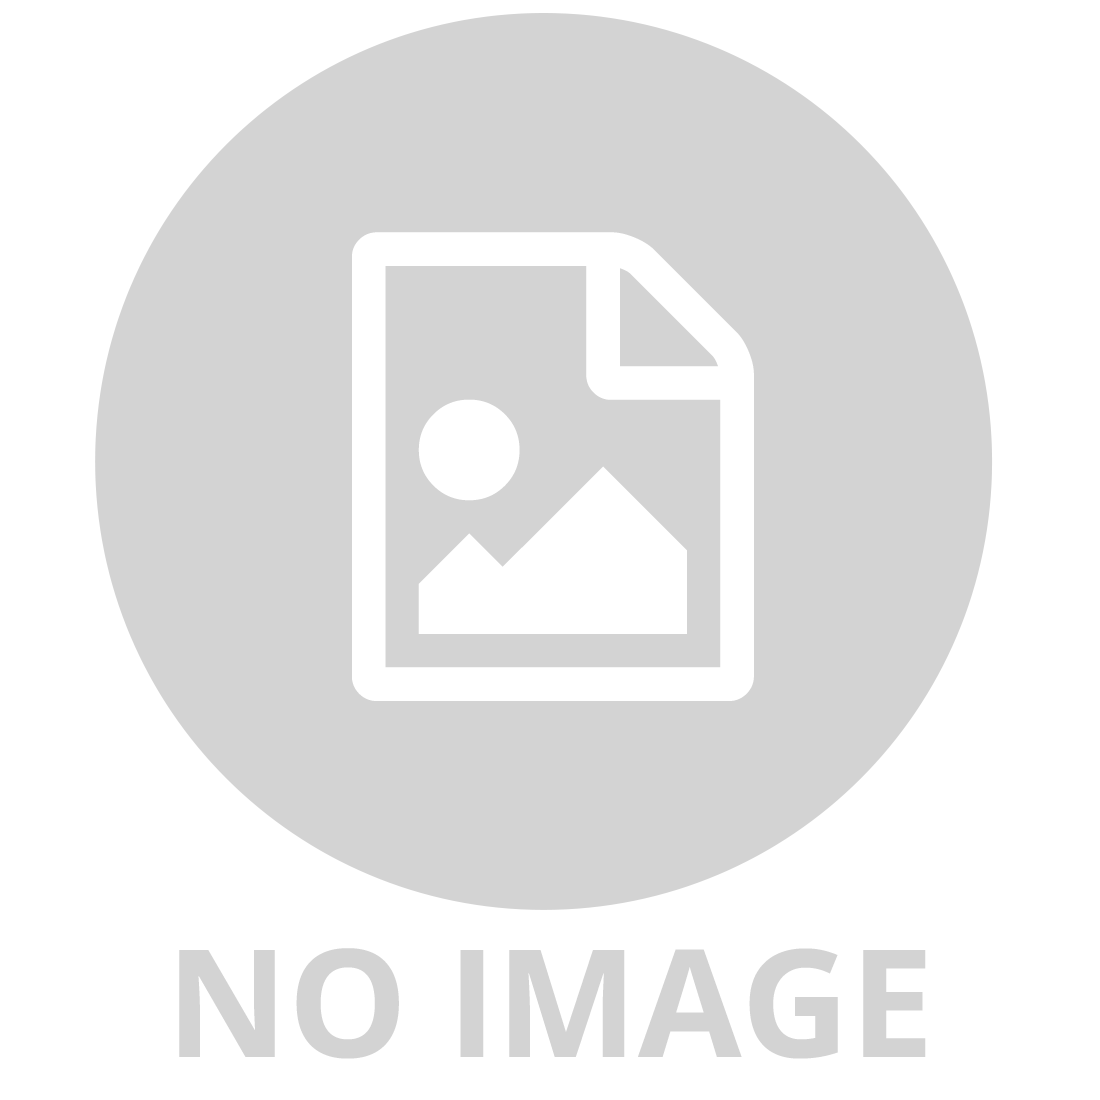 TAMIYA ACRYLIC X 3 ROYAL BLUE GLOSS